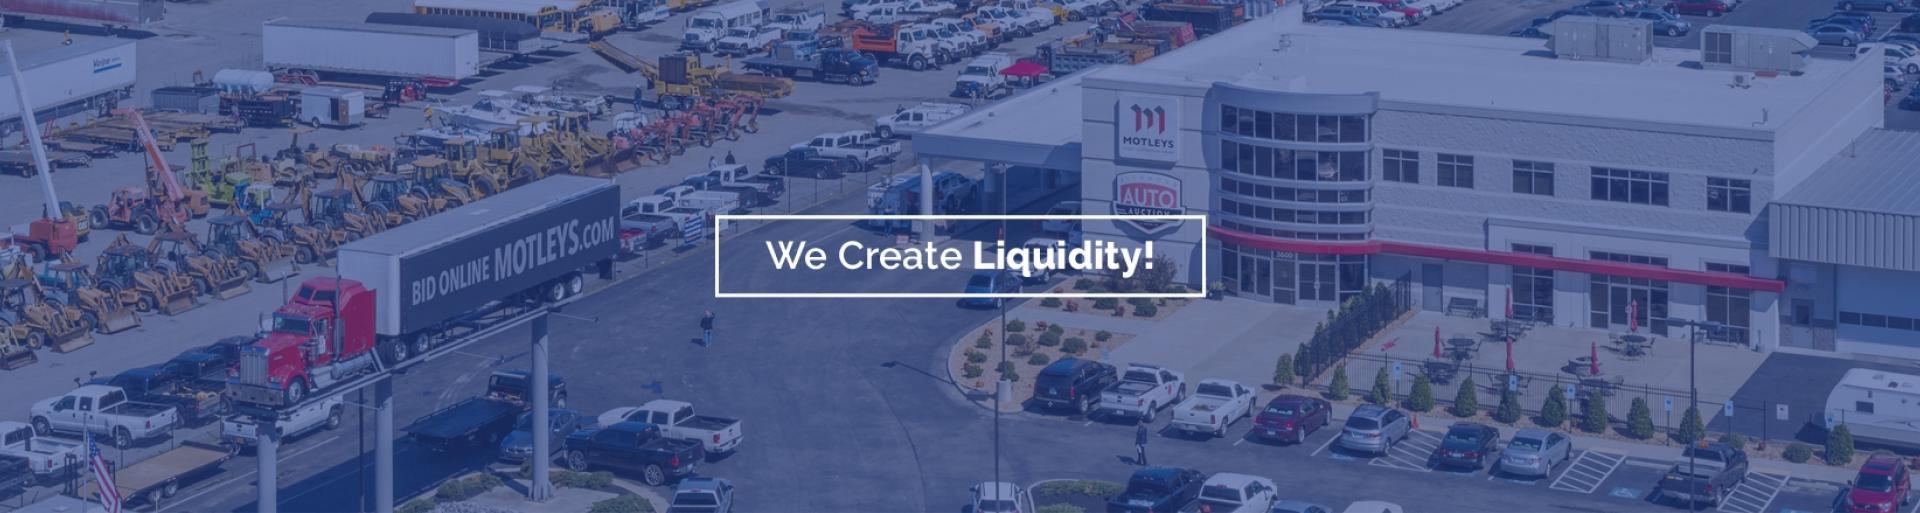 Homepageslider liquidity 122220